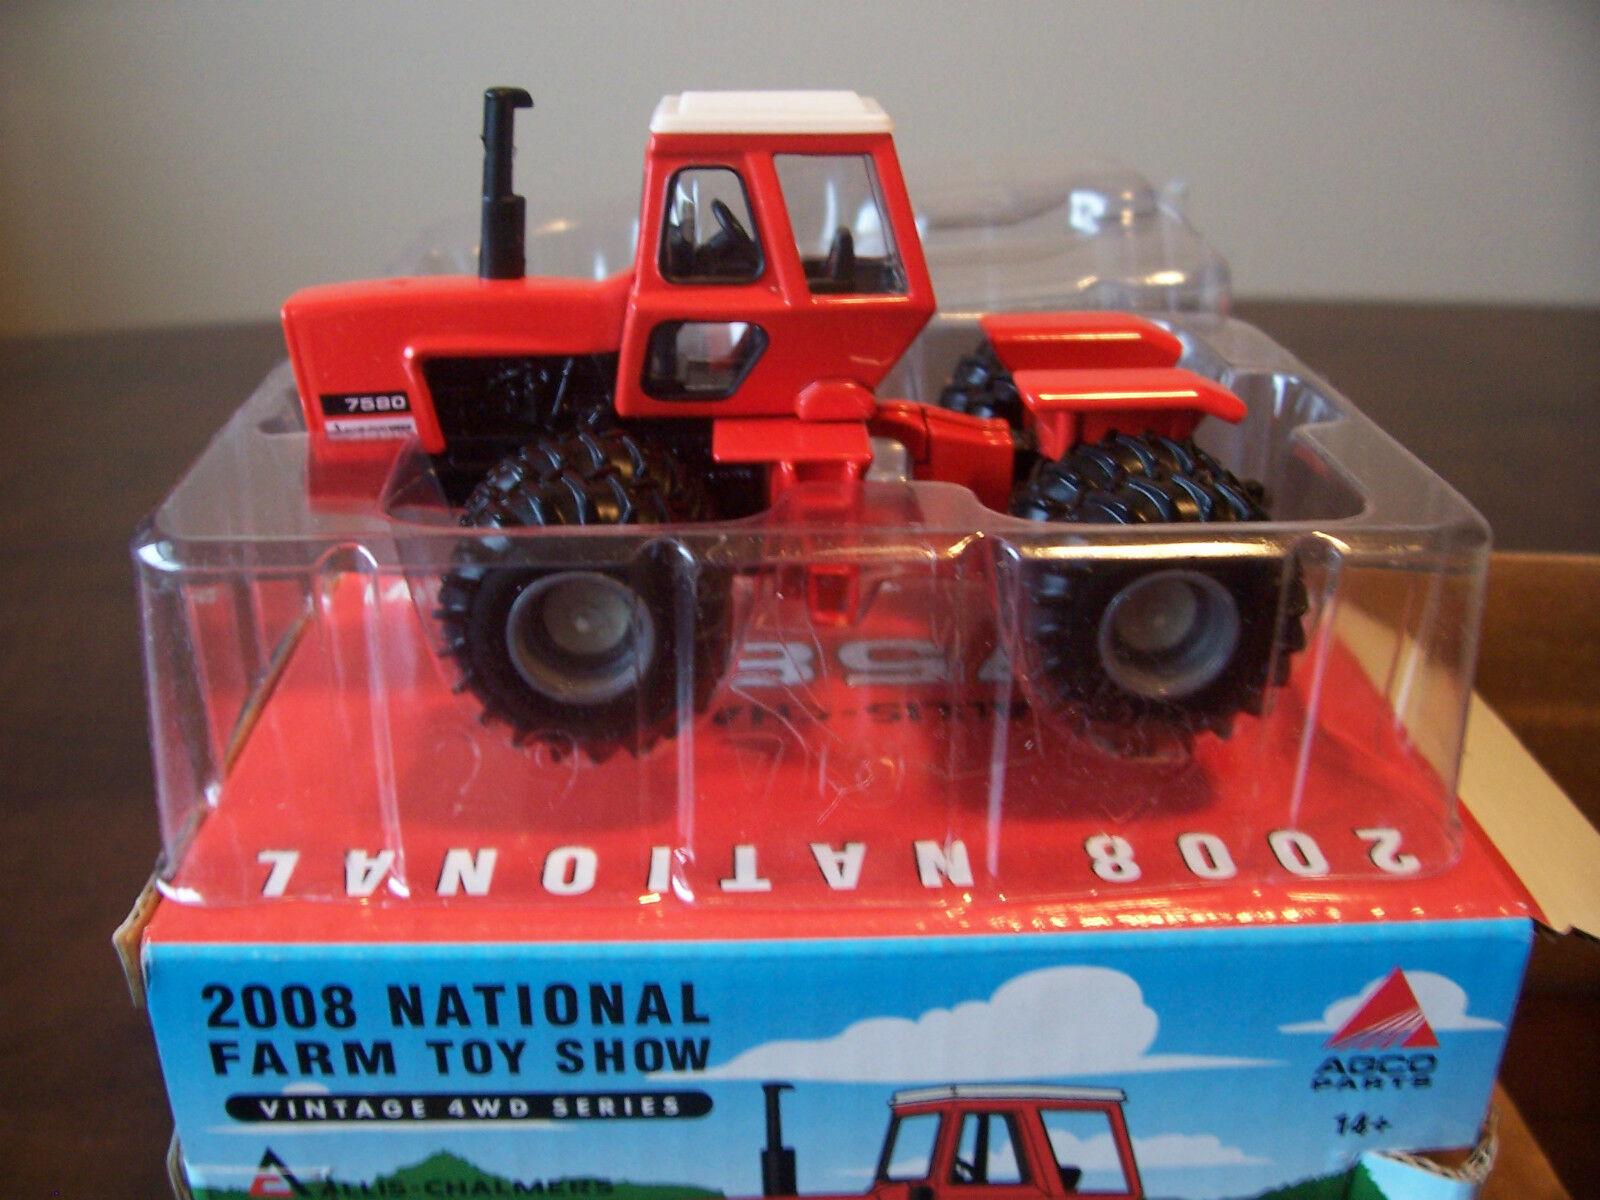 Ertl Juguete Granjero mostrar Vintage Allis Chalmers 7580 Tractor 1 64 Modelo 29710P 2008